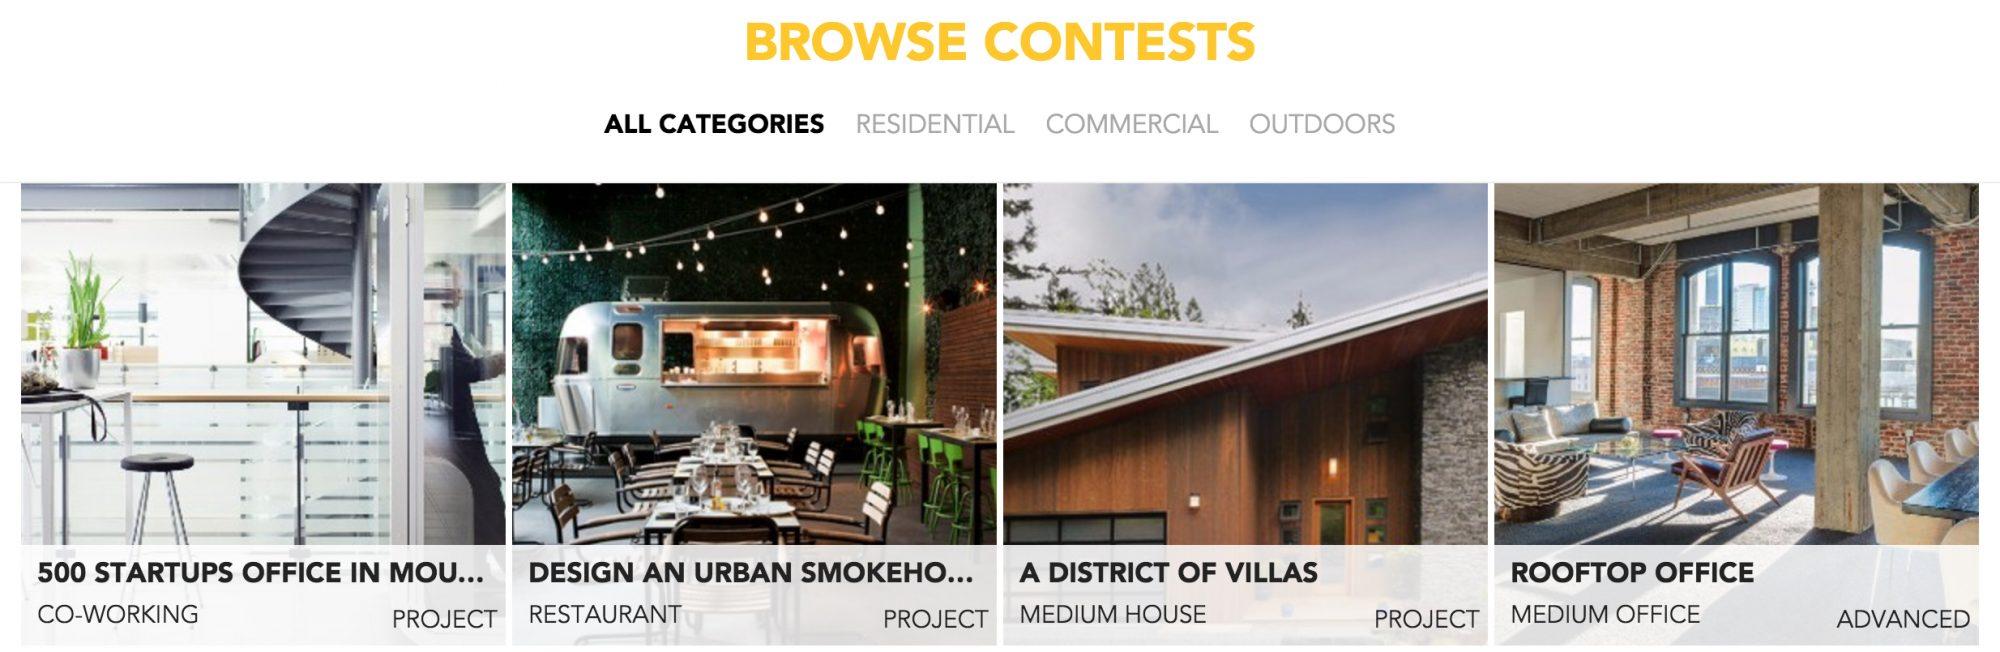 interior-designers-online-browse-contests-cocontest-2016-11-14-11-00-38